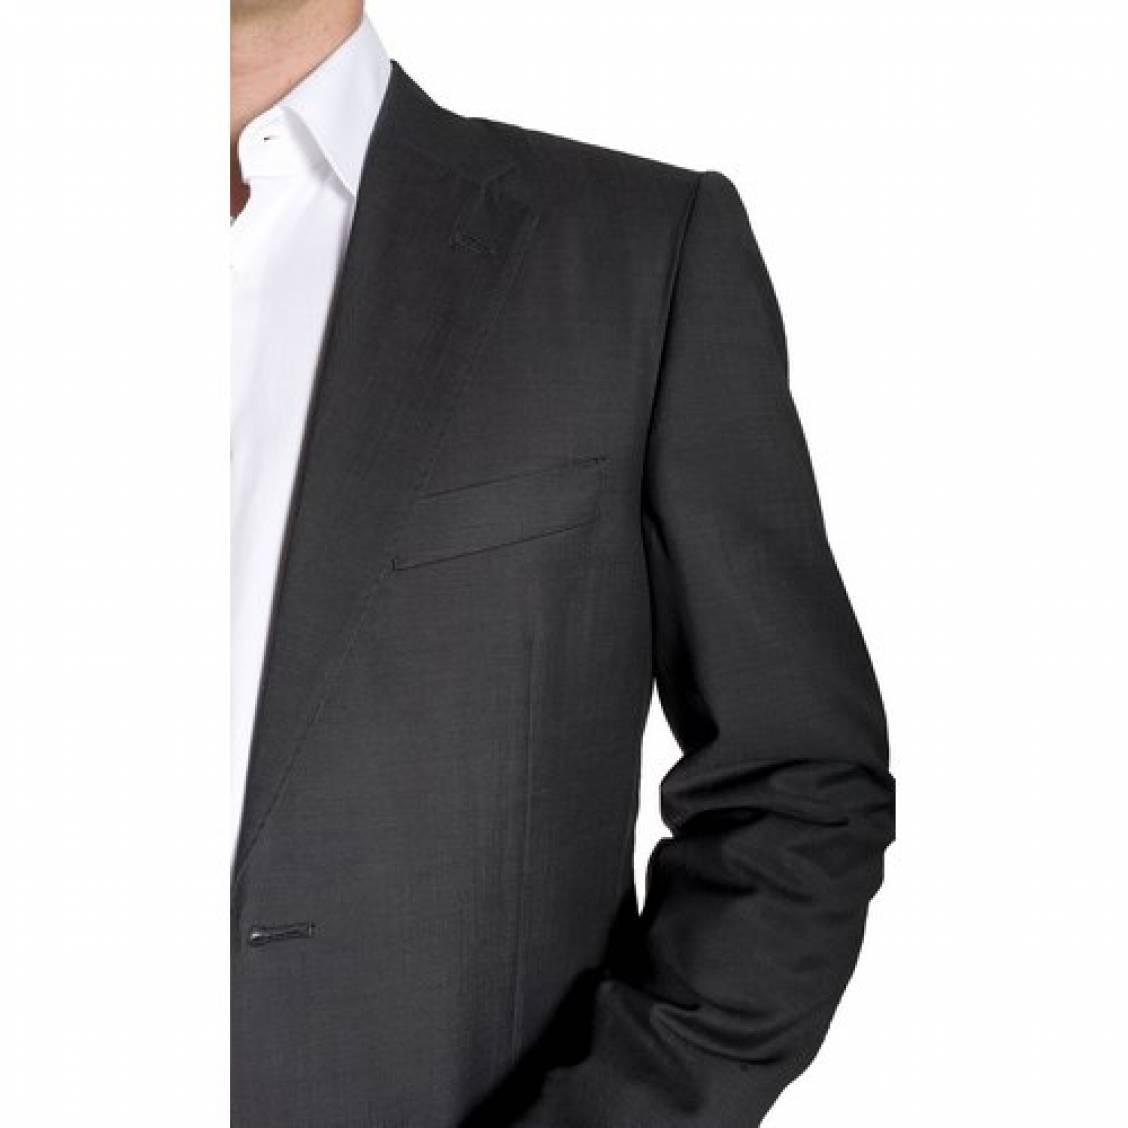 Costume semi cintr gris anthracite super 150 39 s rue des hommes - Costume gris fonce ...